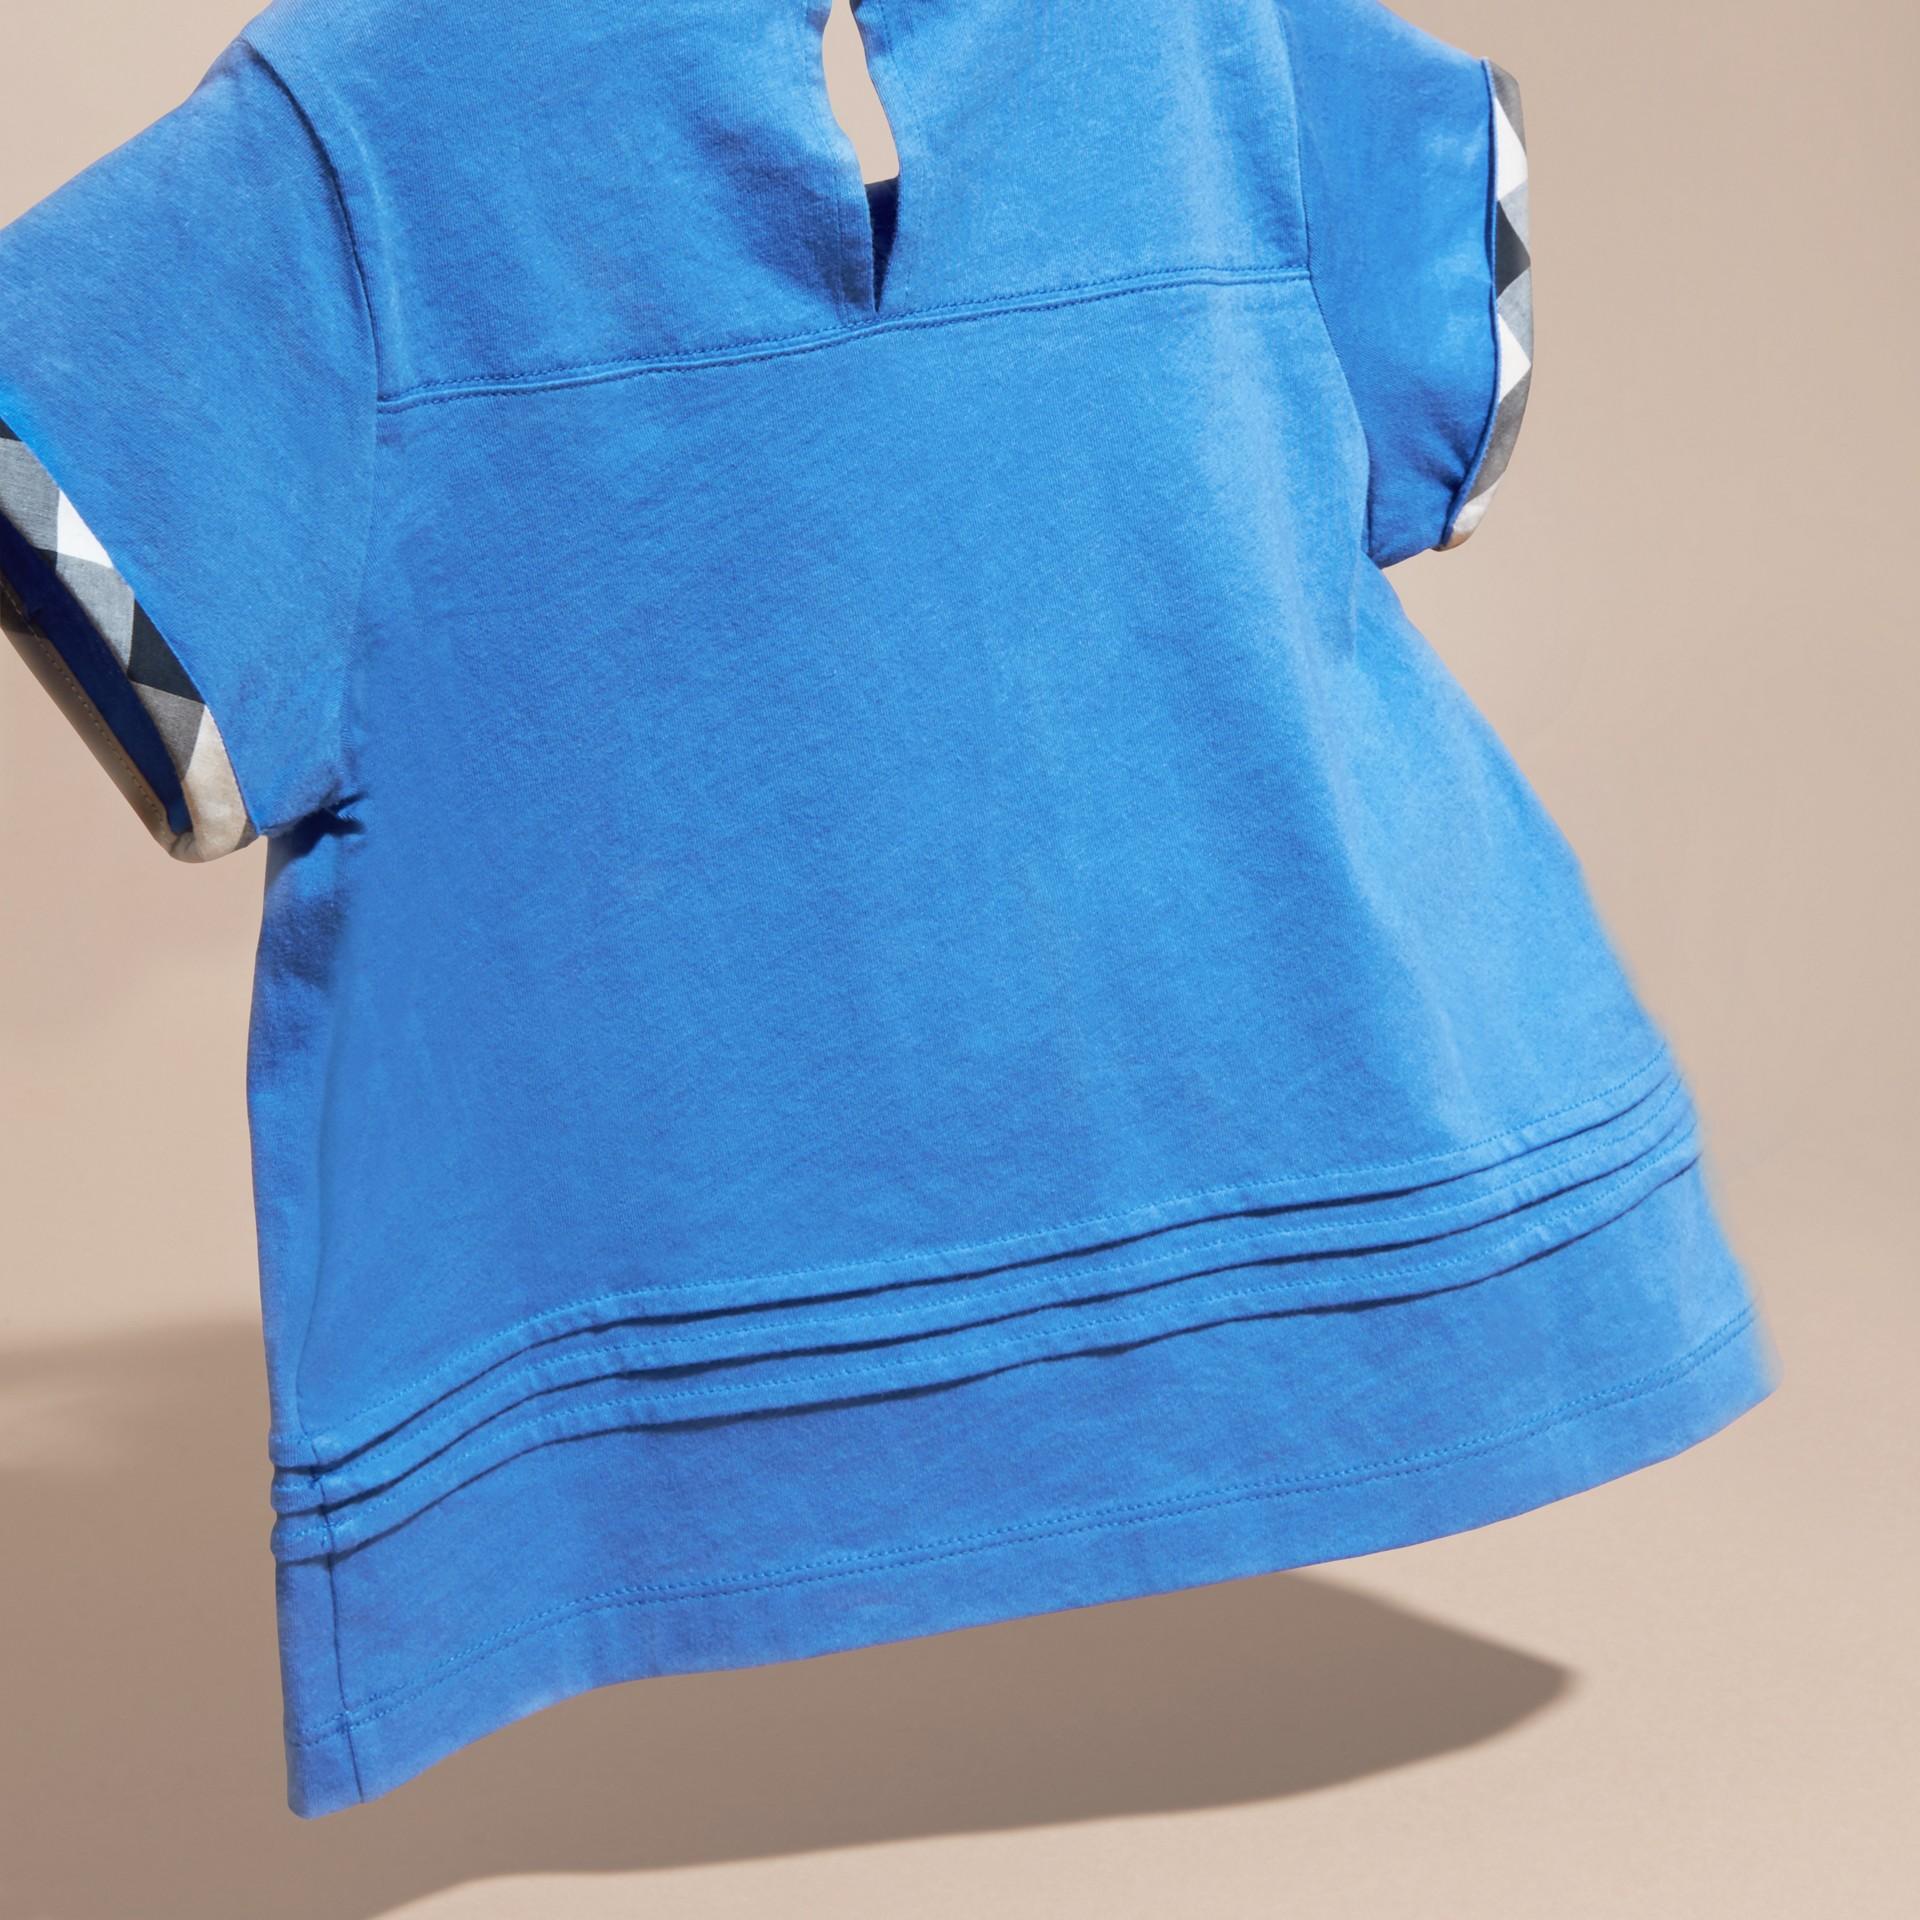 Bleu hortensia vif T-shirt à plis en coton à motif check Bleu Hortensia Vif - photo de la galerie 4